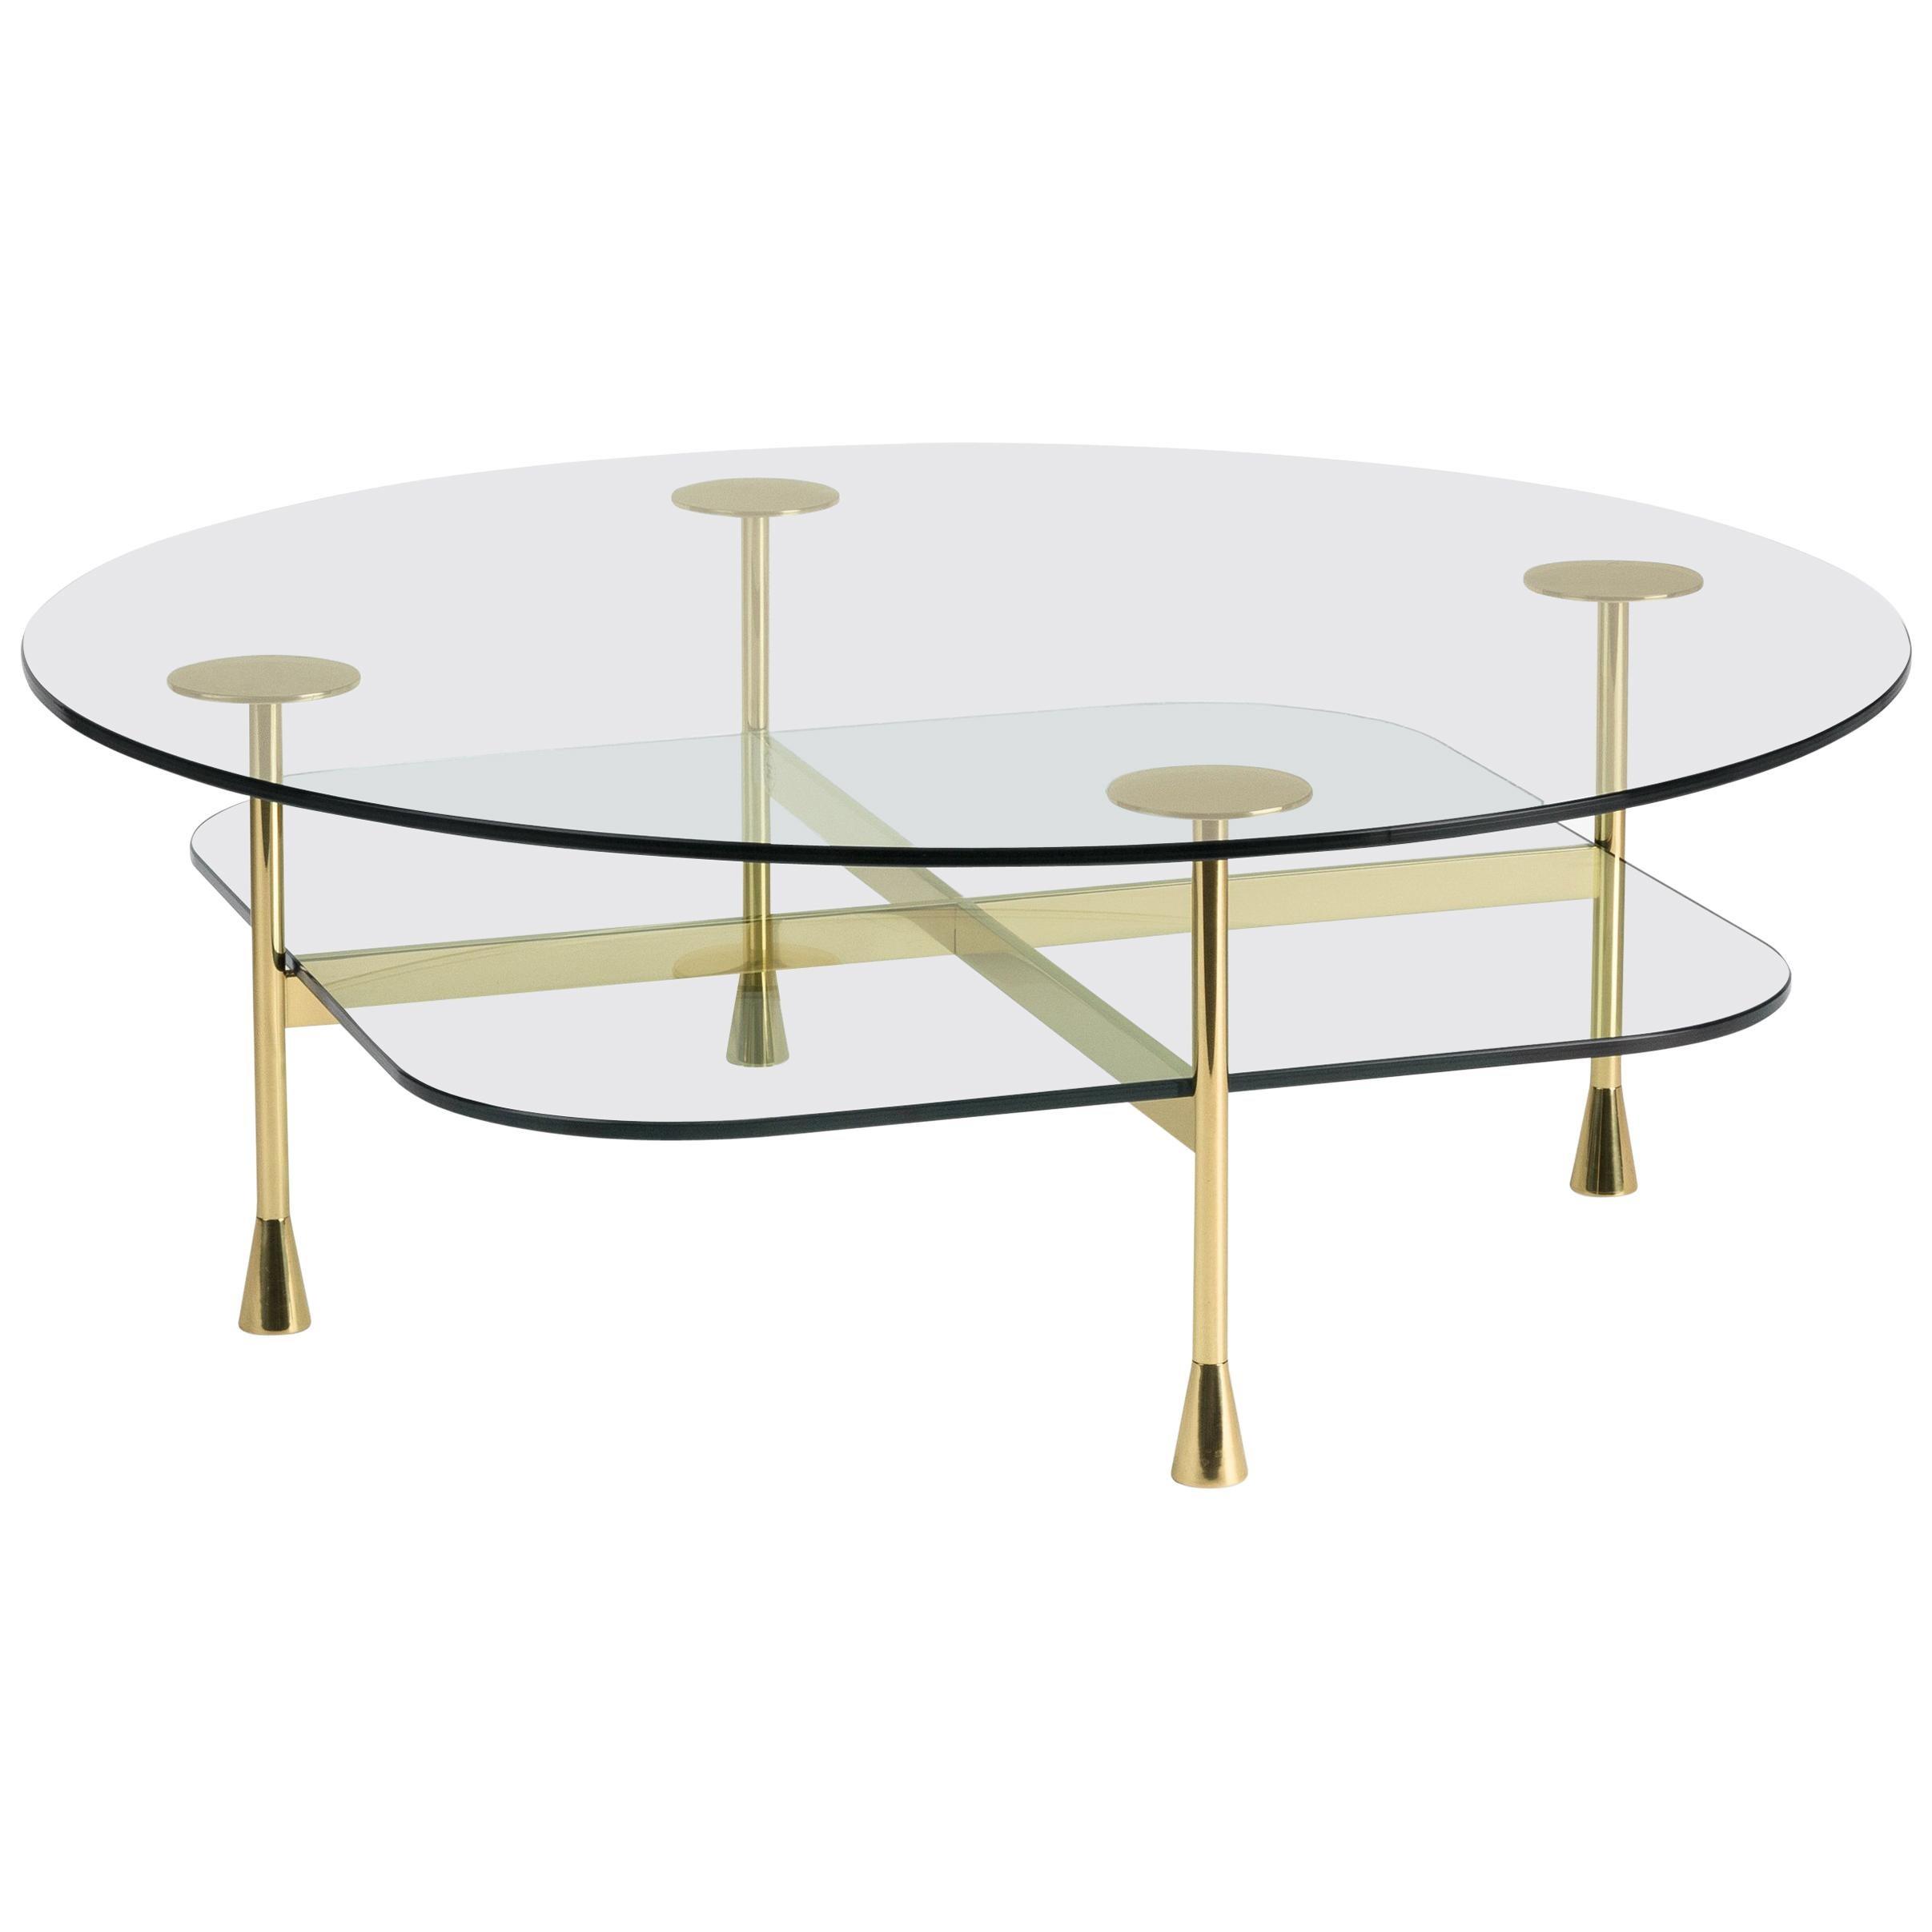 Ghidini 1961 Da Vinci Round Table in Crystal by Richard Hutten